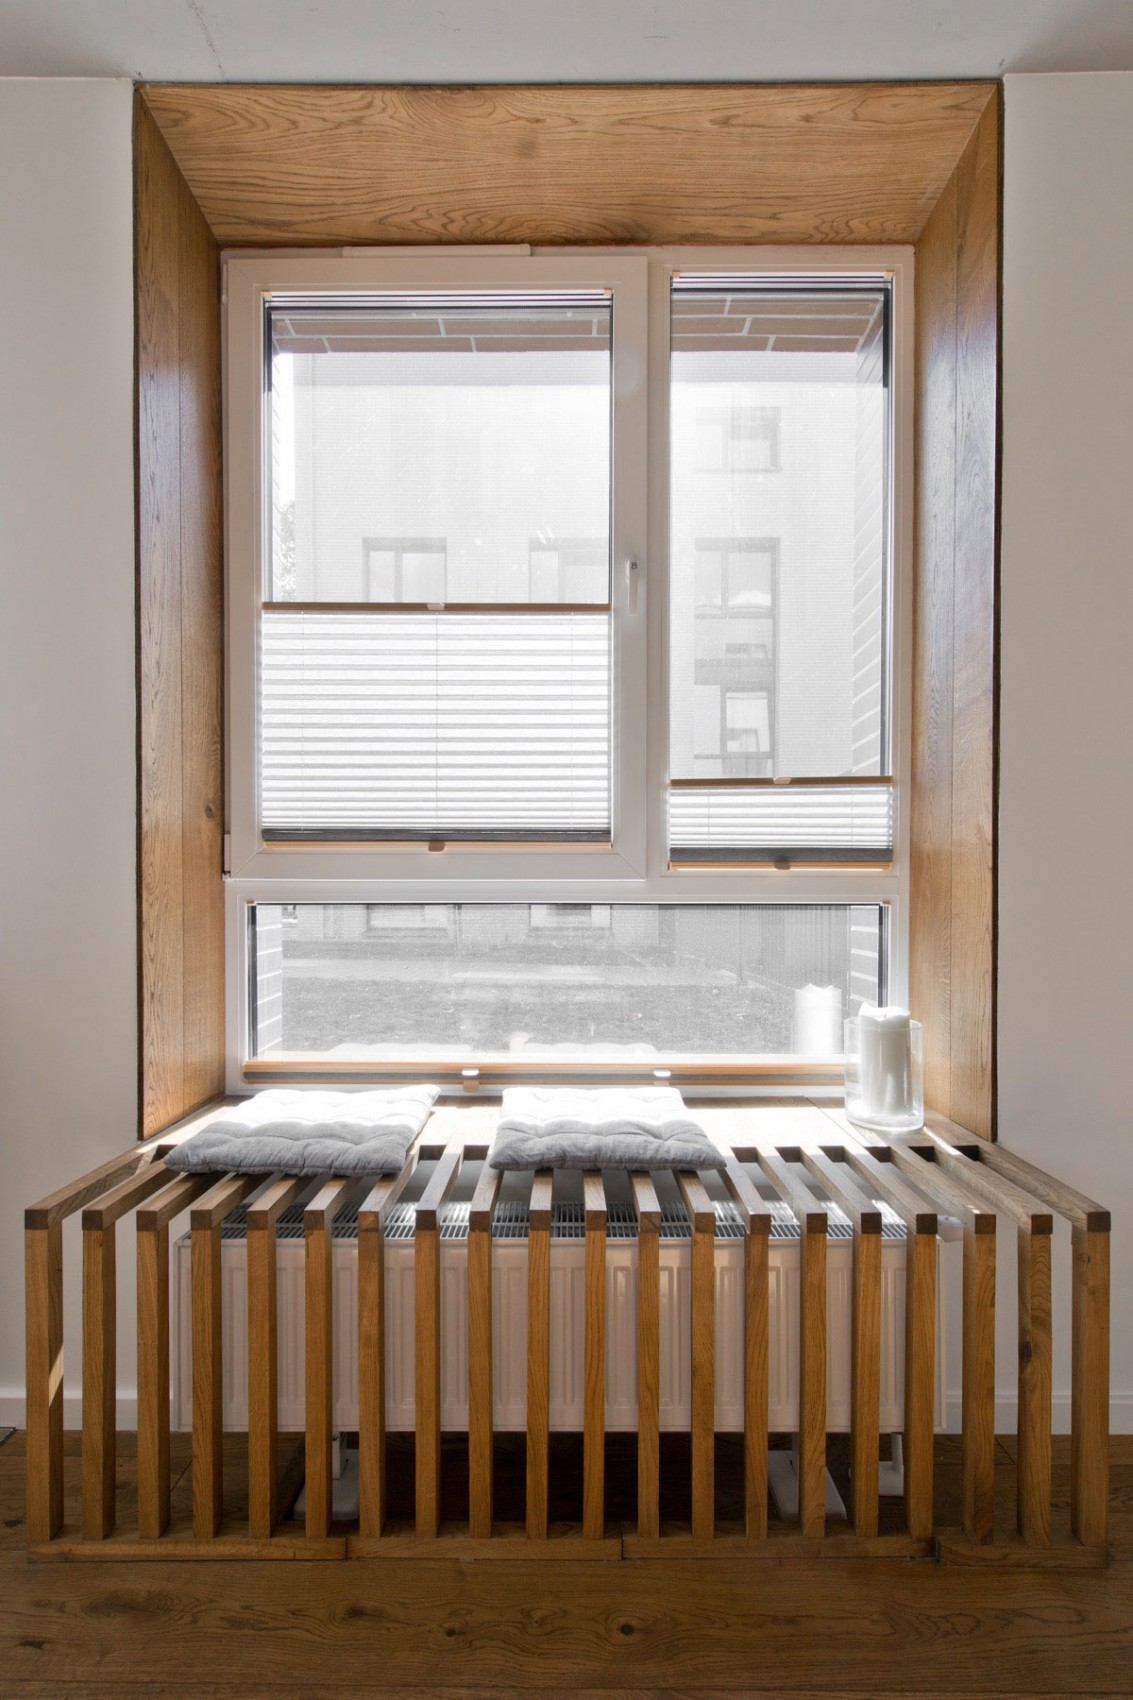 Scandinavian Interior Design In A Beautiful Small Apartment Architecture Beast,Muslim Fashion Designers